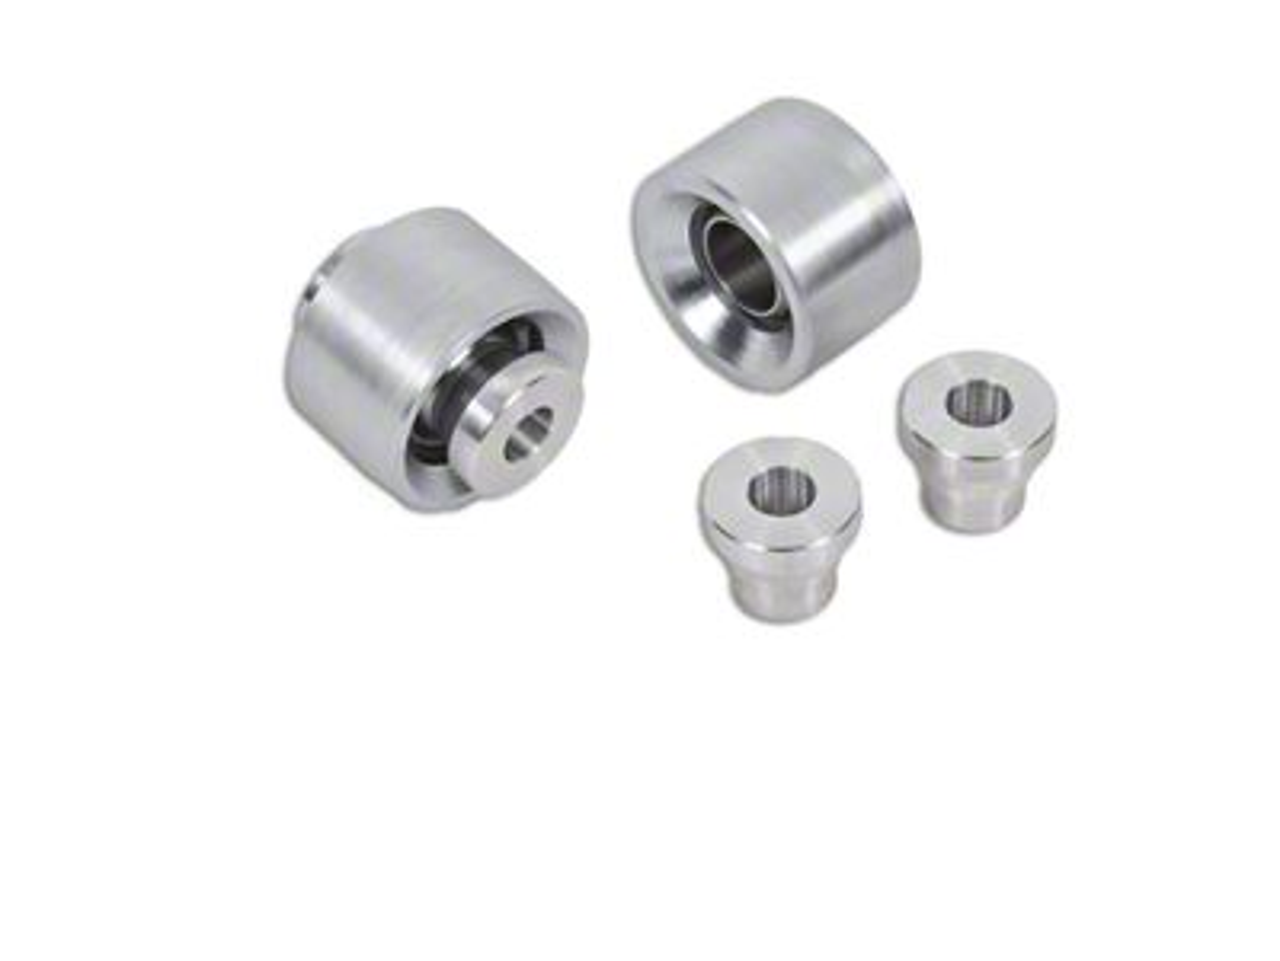 BMR Standard Rear Lower Control Arm Bearing Kit (15-19 All)